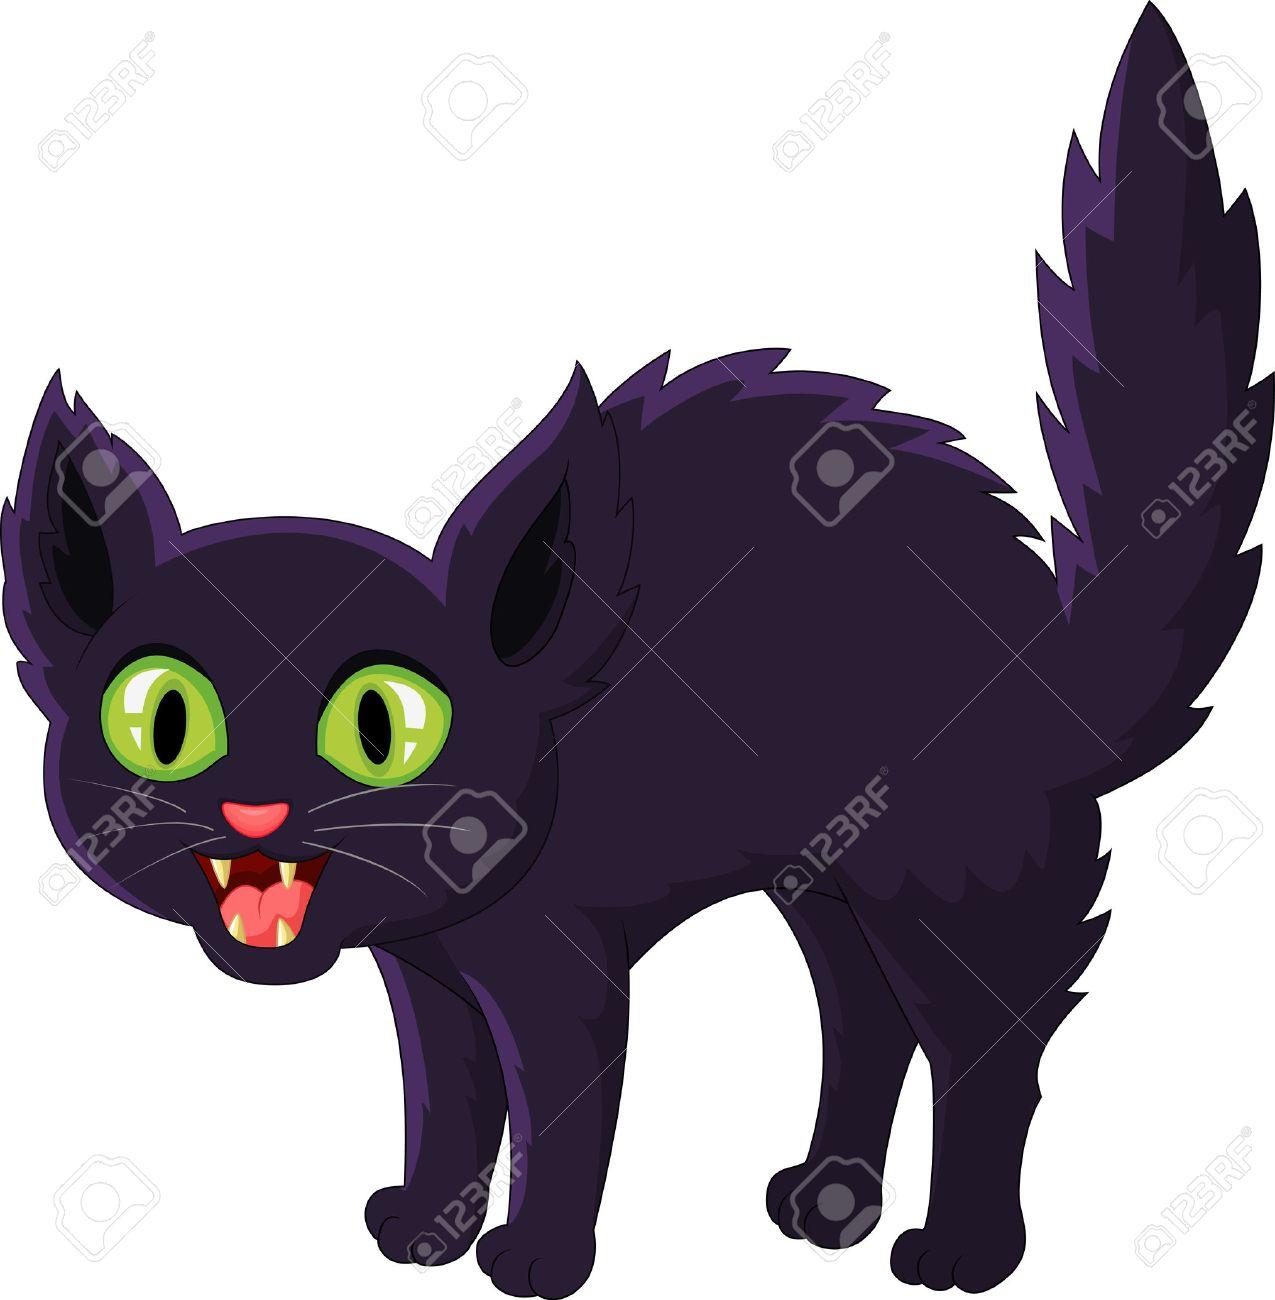 Frightened cartoon black cat - 33367598